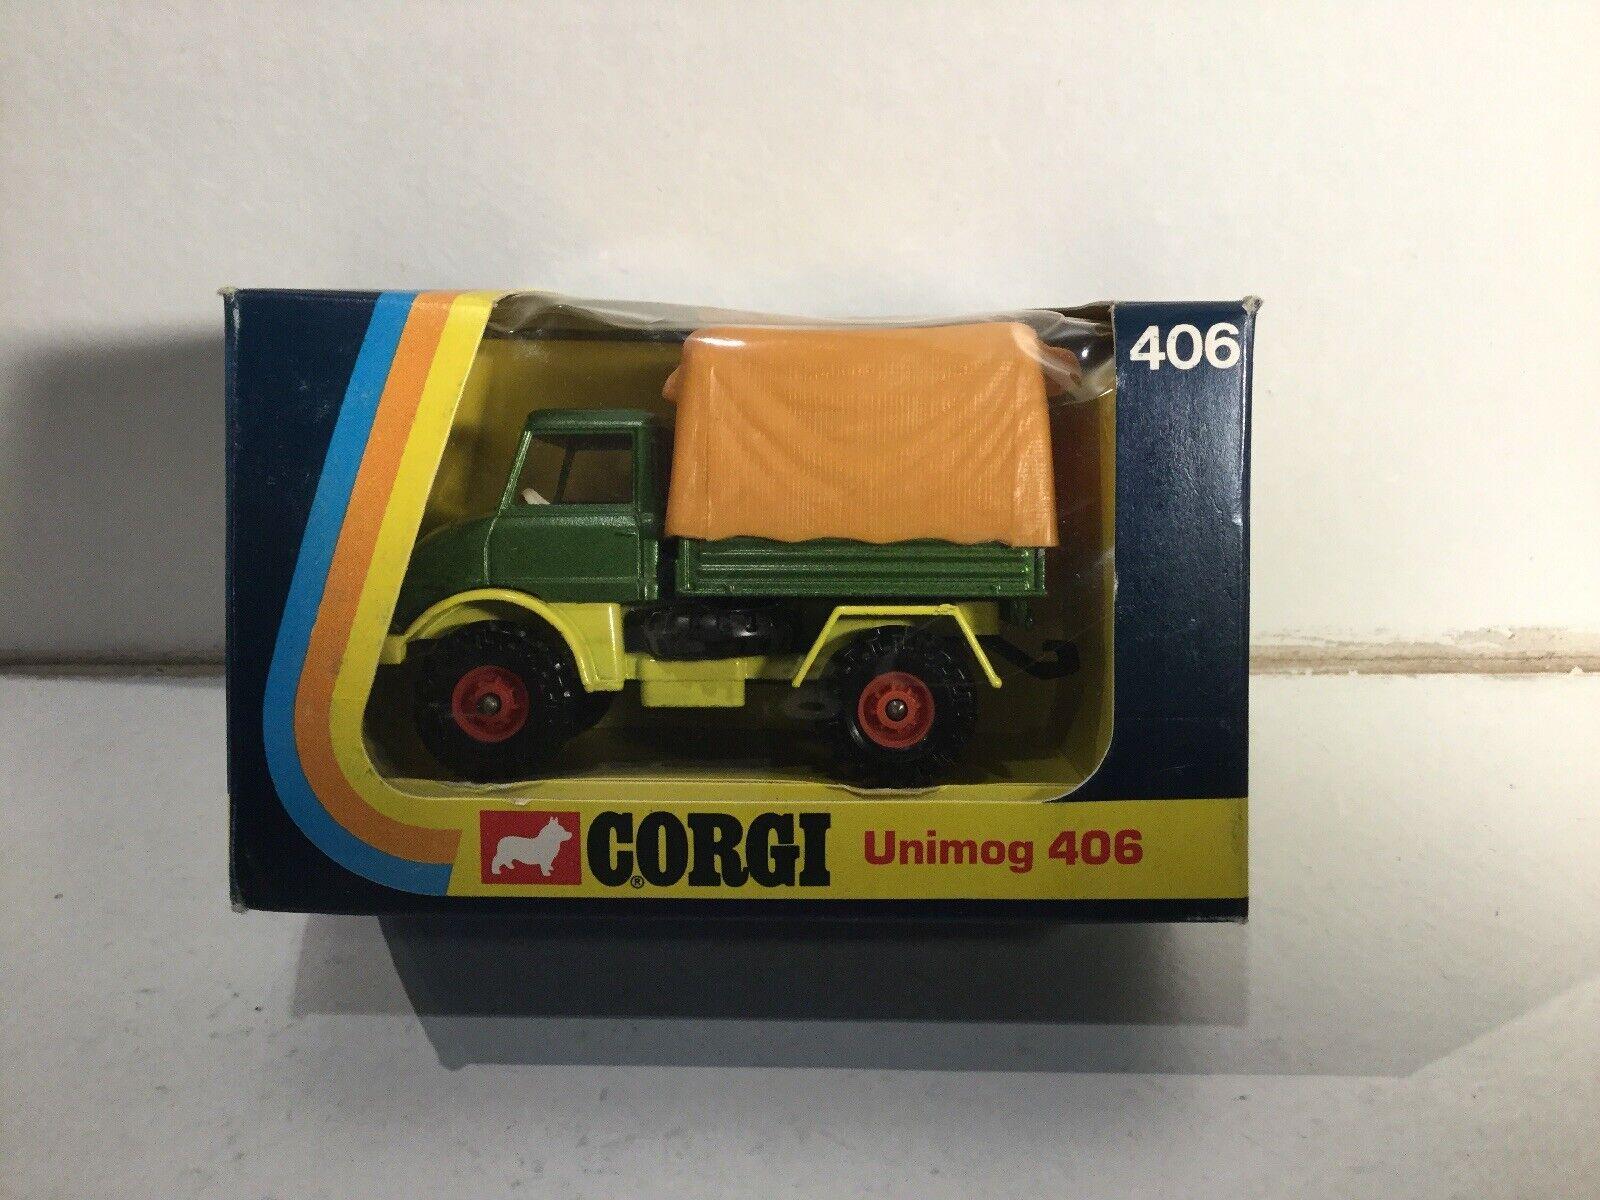 Vintage Corgi 406 Unimog Mercedes benz Near Mint Within Its Original In Box